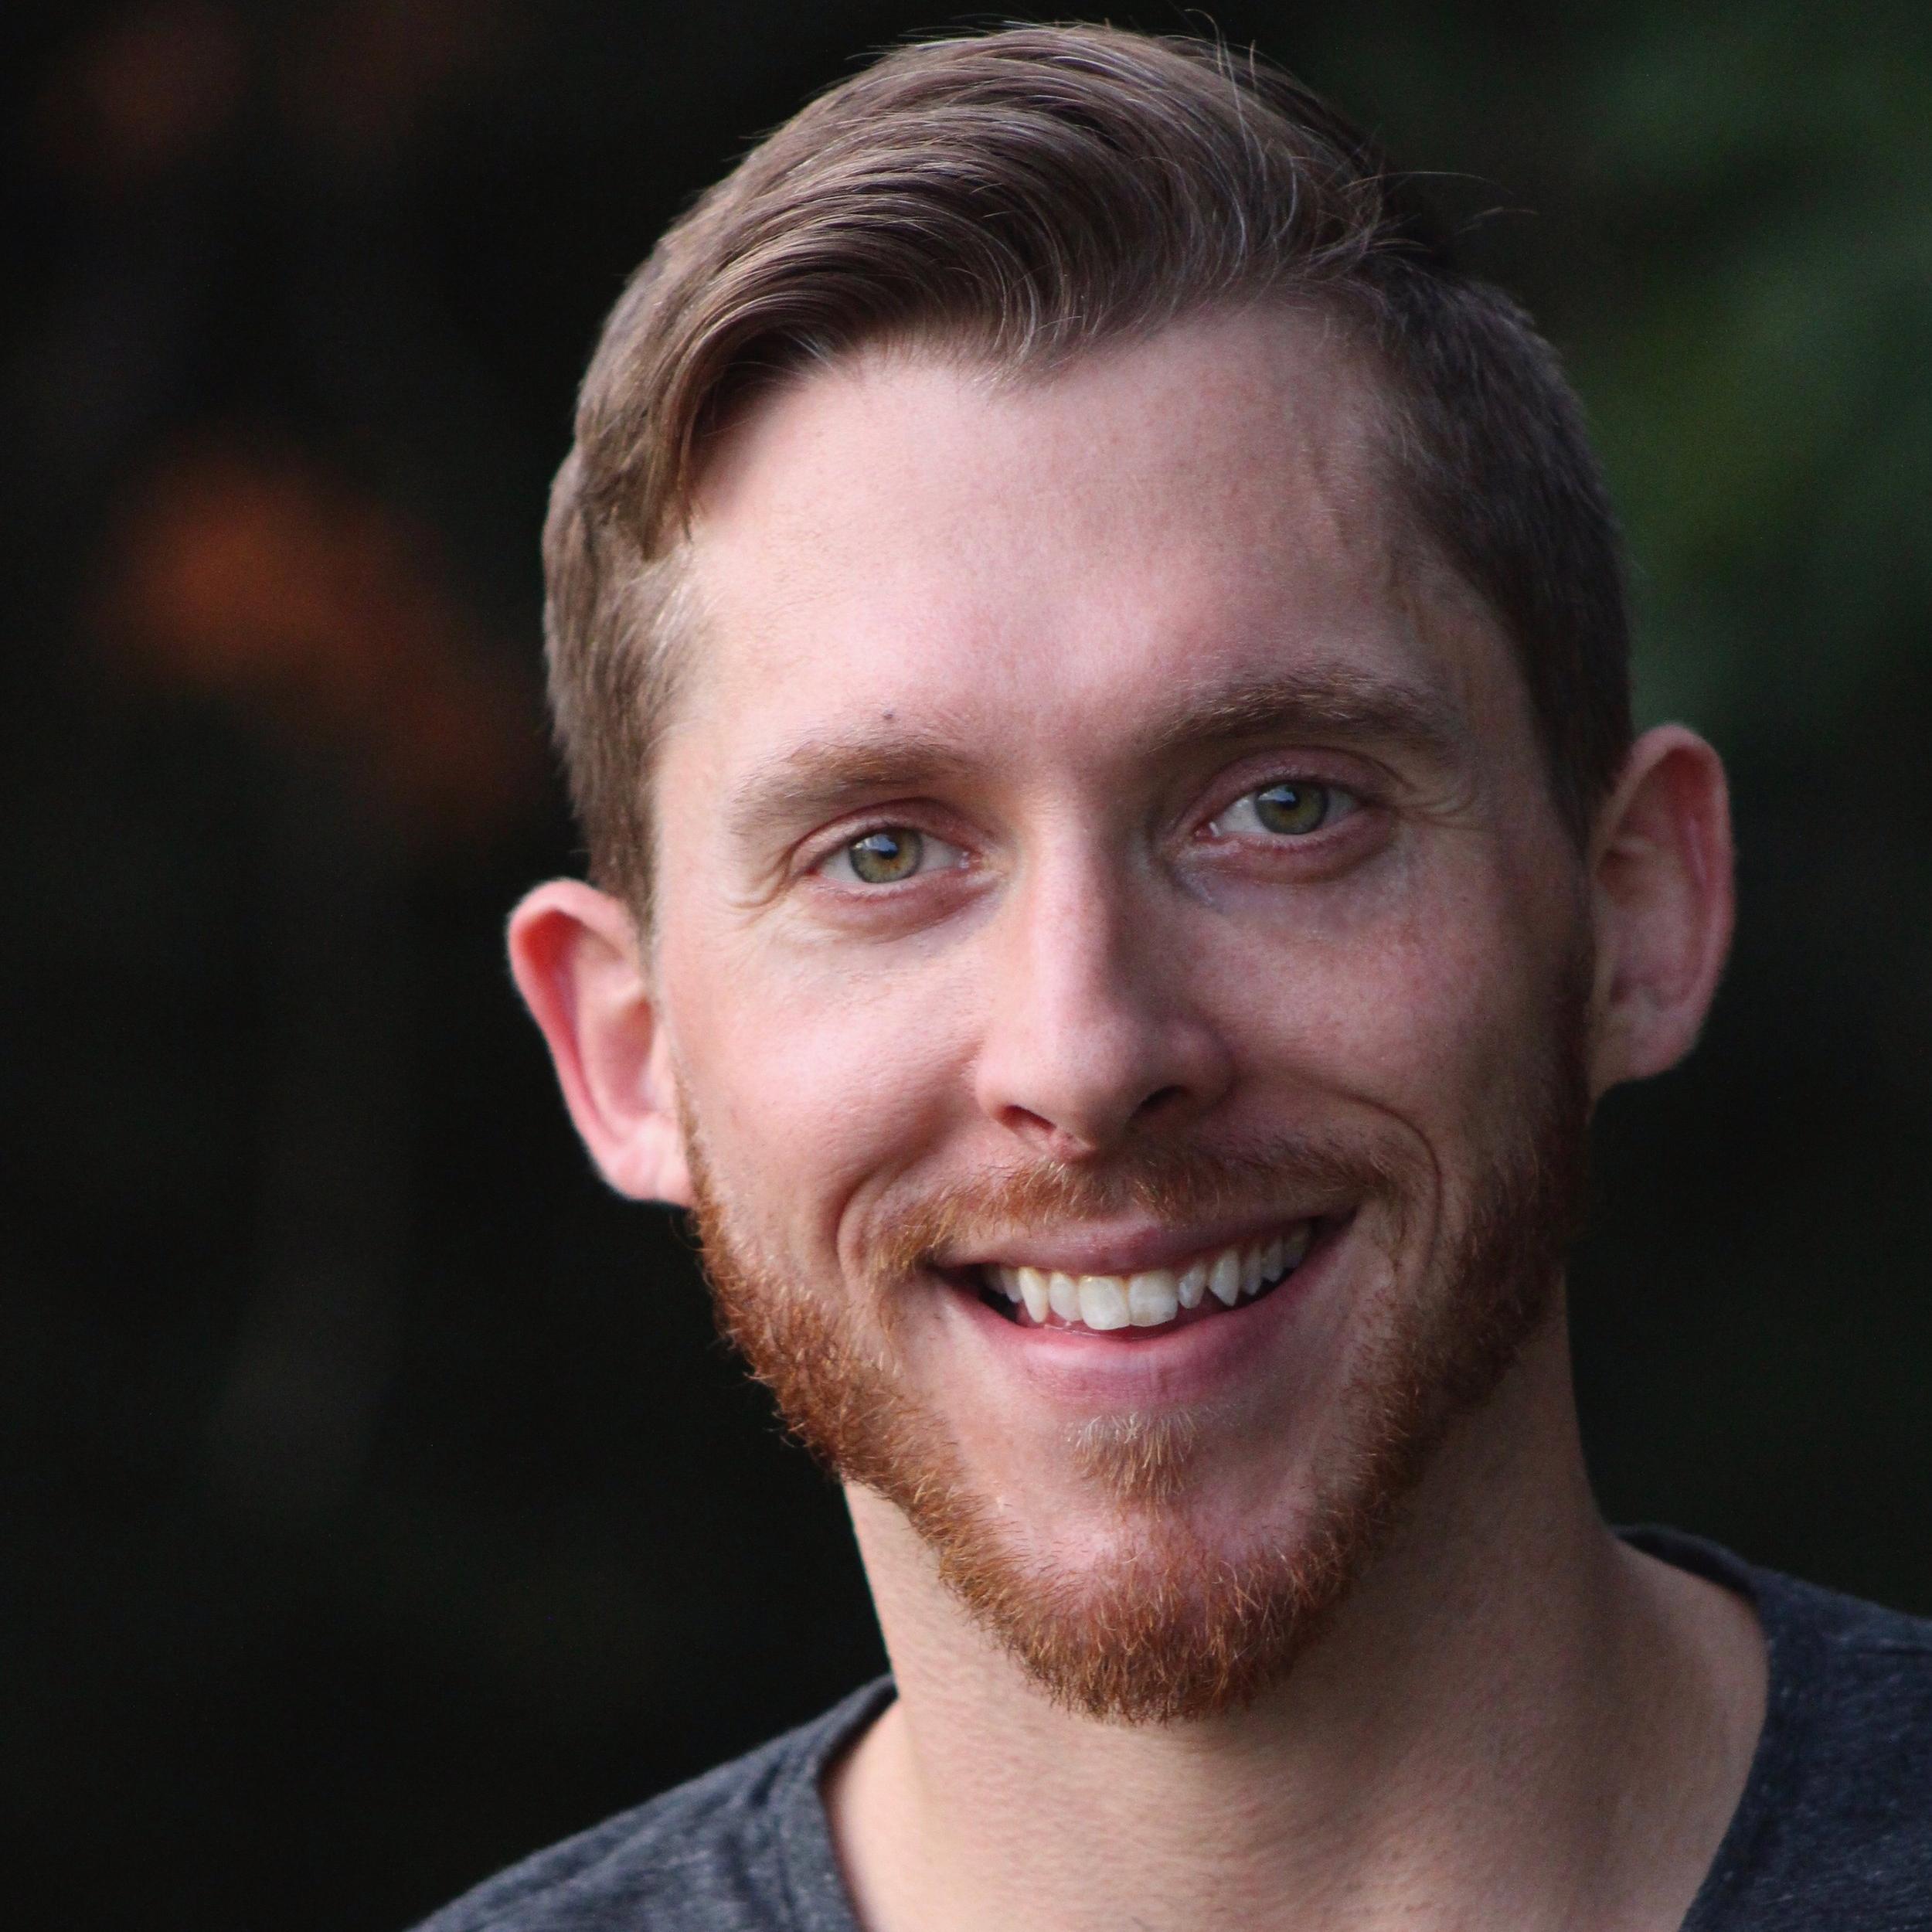 Tim O'Keefe - The Gay White Boy Dilemma